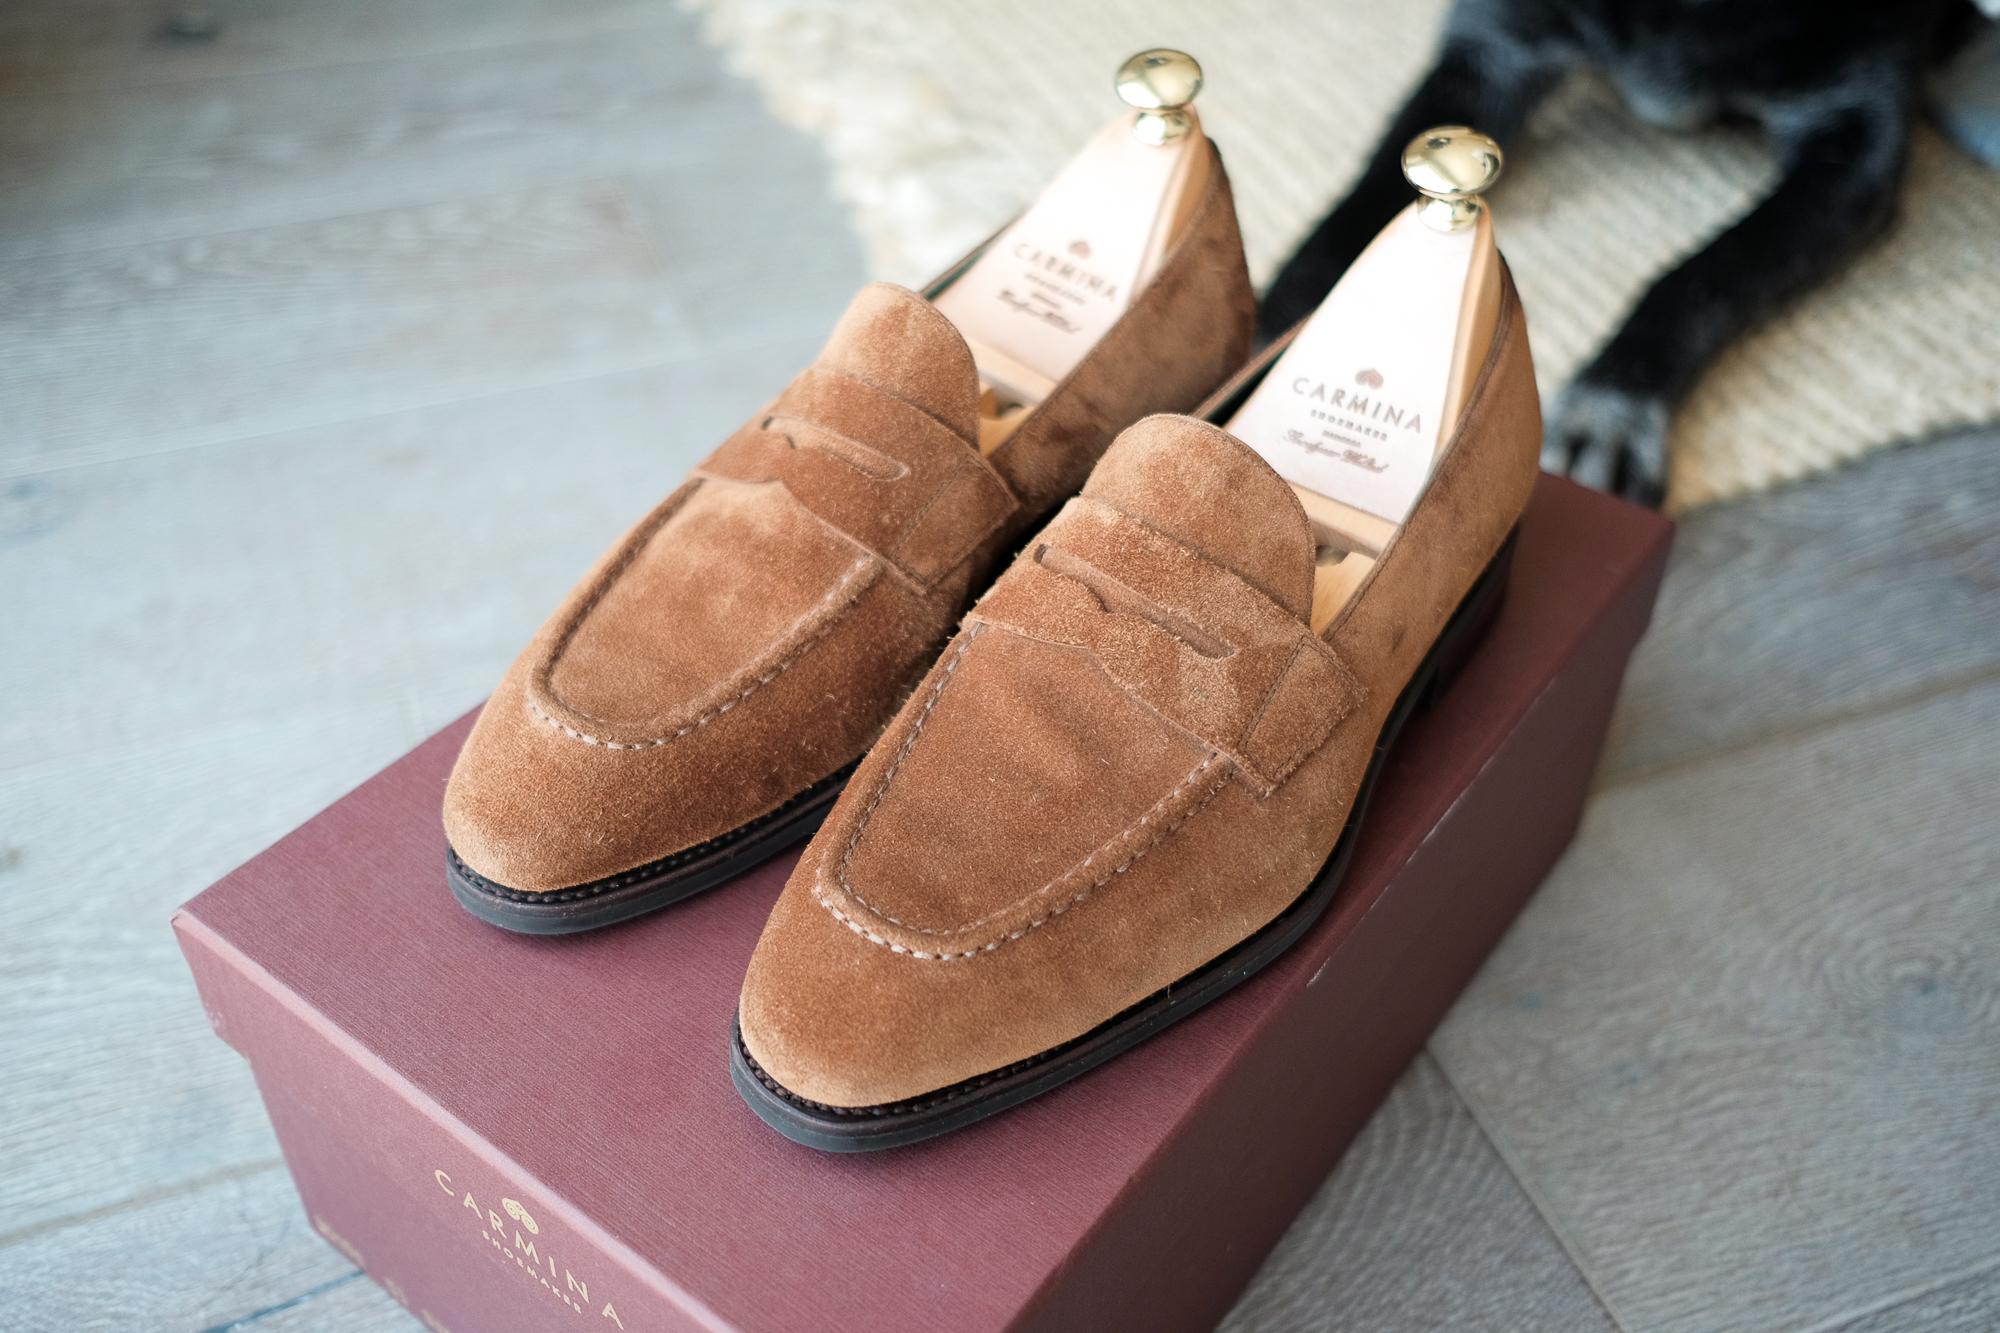 carmina_loafers-1.jpg